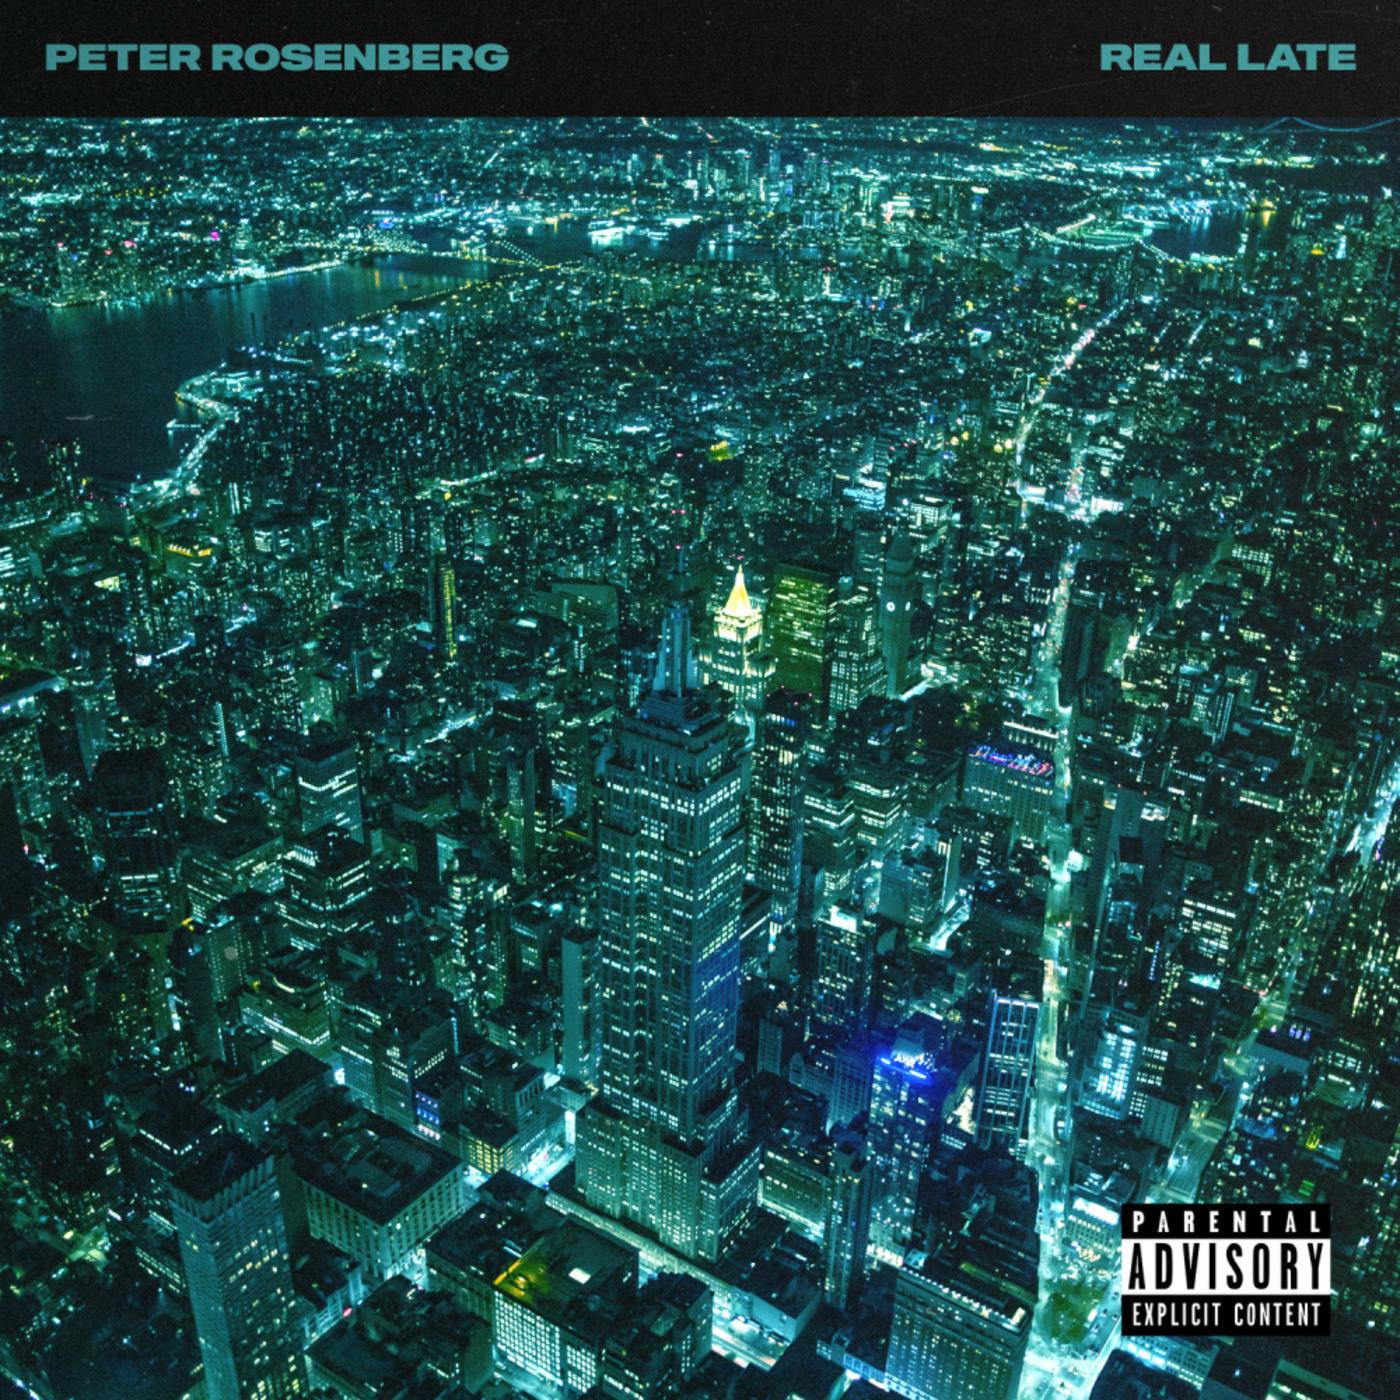 peter-rosenberg-real-late-cover